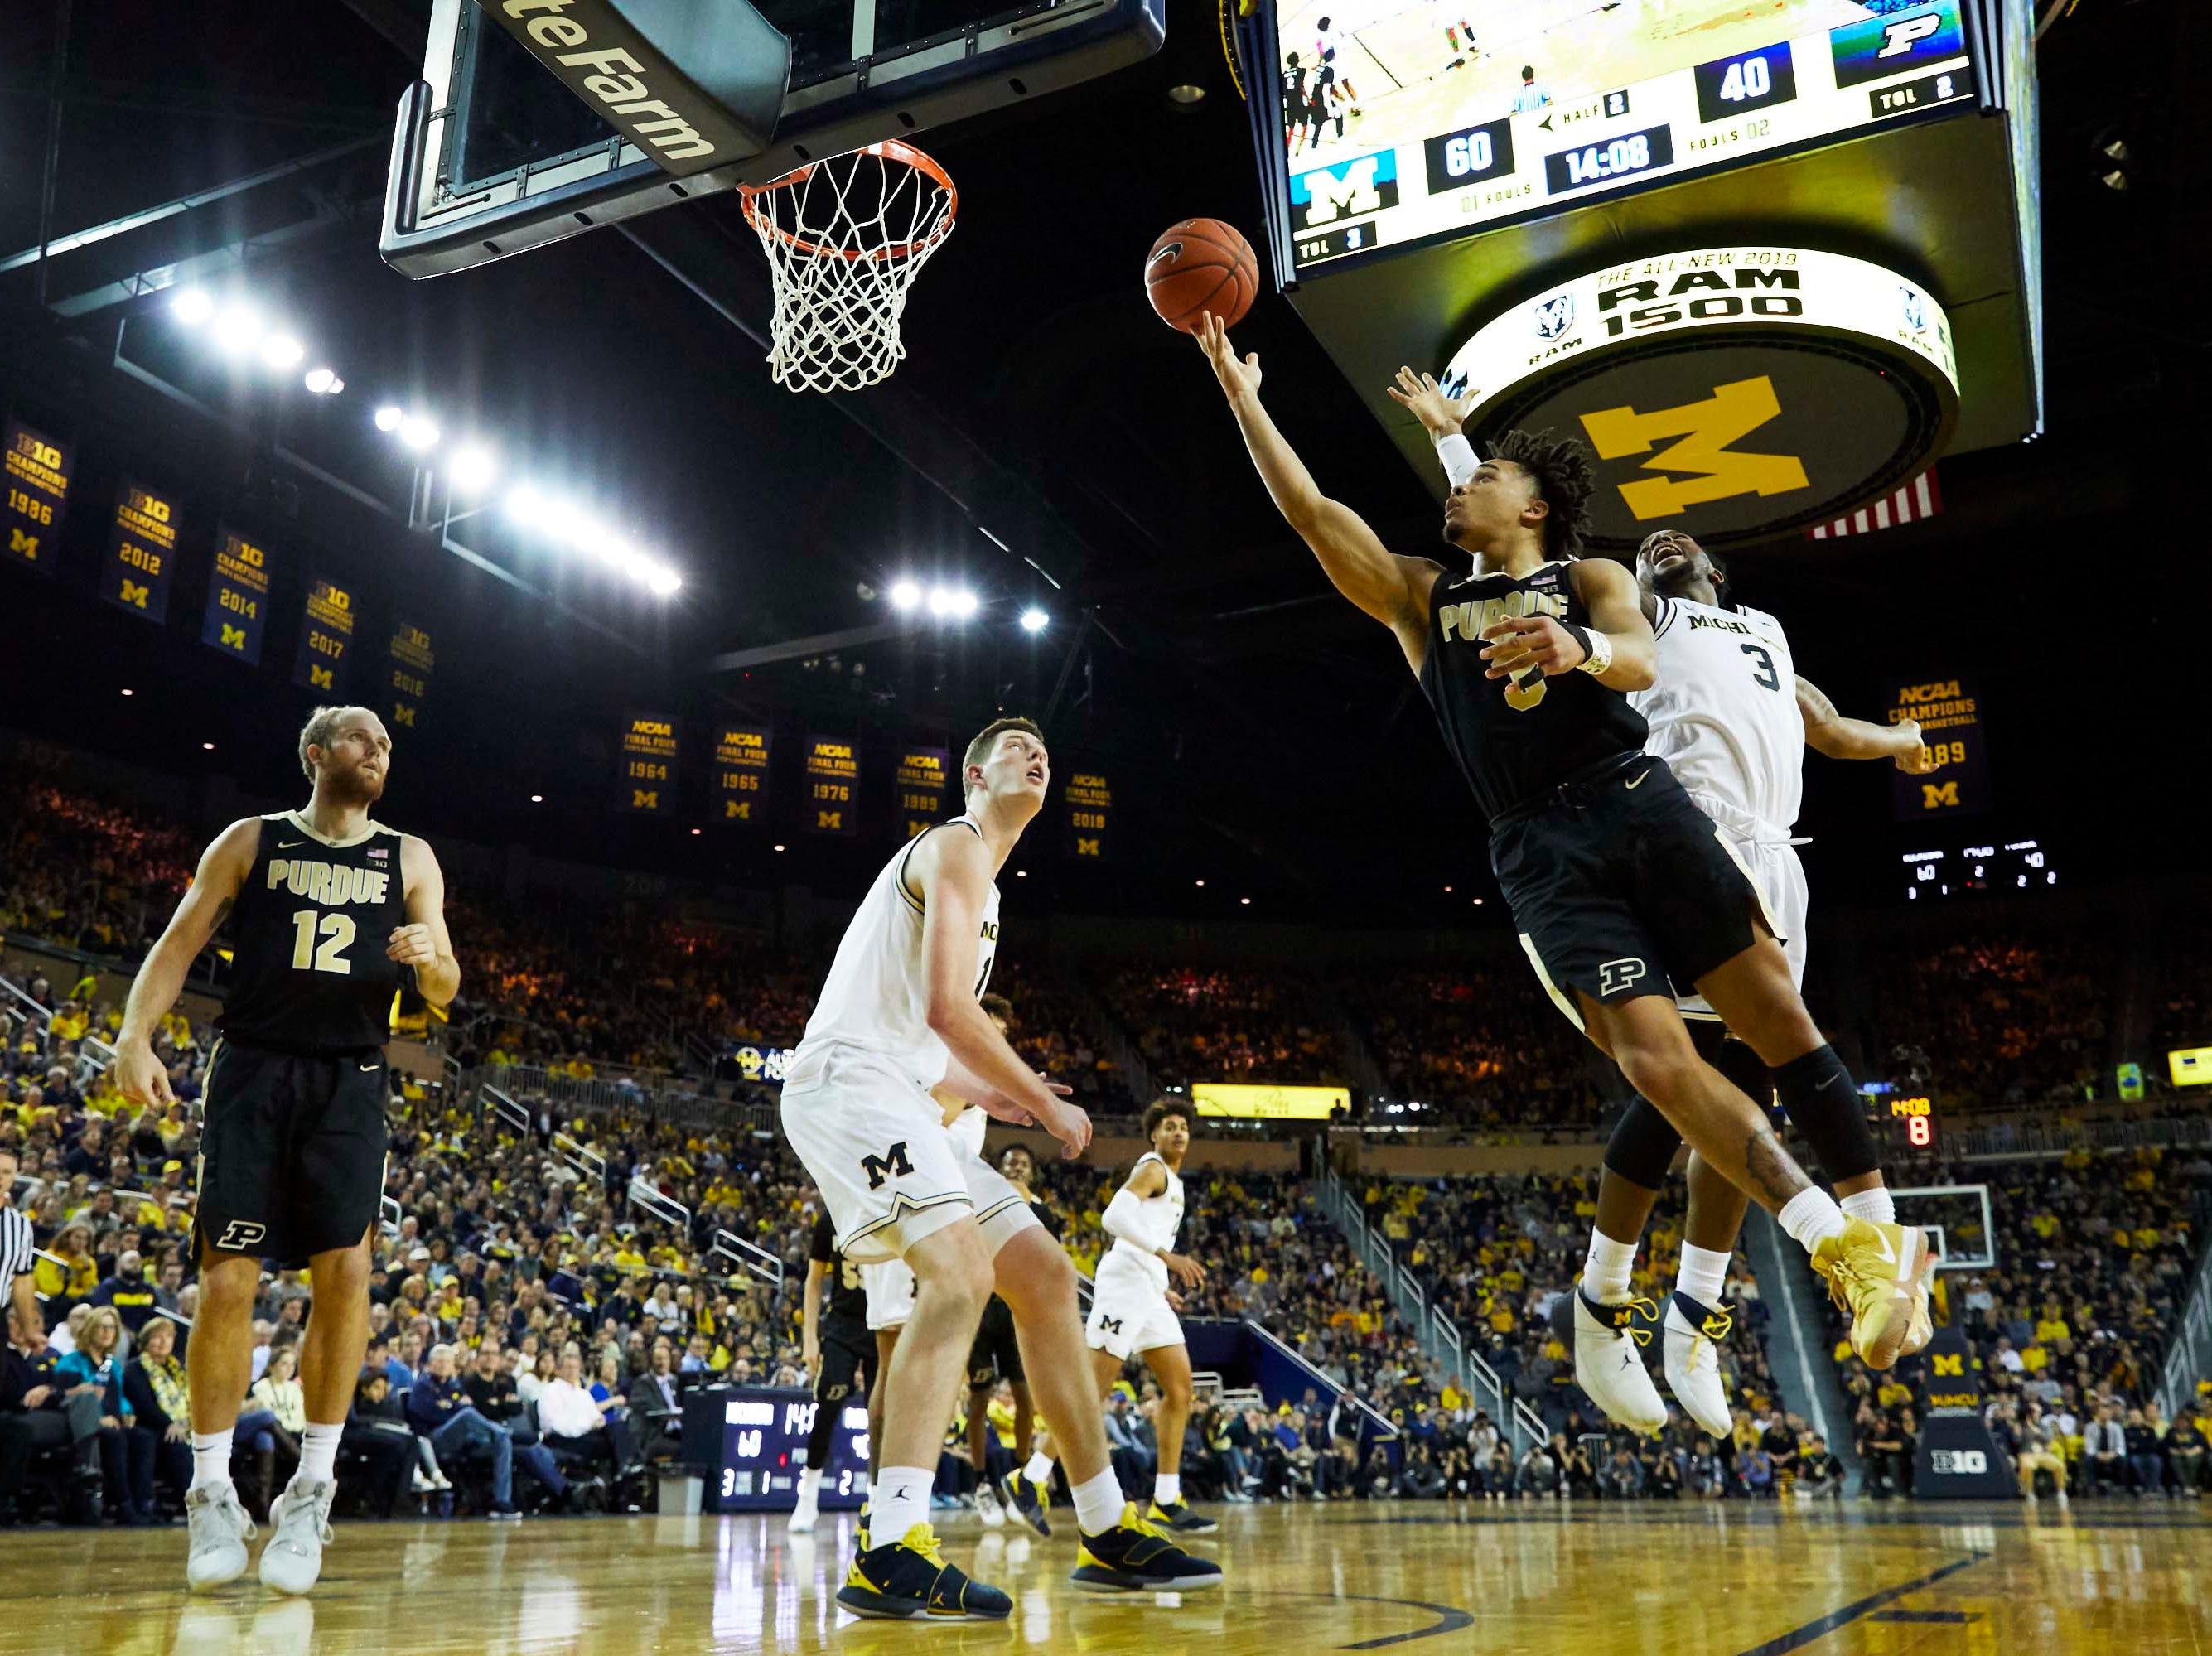 Dec 1, 2018; Ann Arbor, MI, USA; Purdue Boilermakers guard Carsen Edwards (3) shoots on Michigan Wolverines guard Zavier Simpson (3) in the second half at Crisler Center. Mandatory Credit: Rick Osentoski-USA TODAY Sports